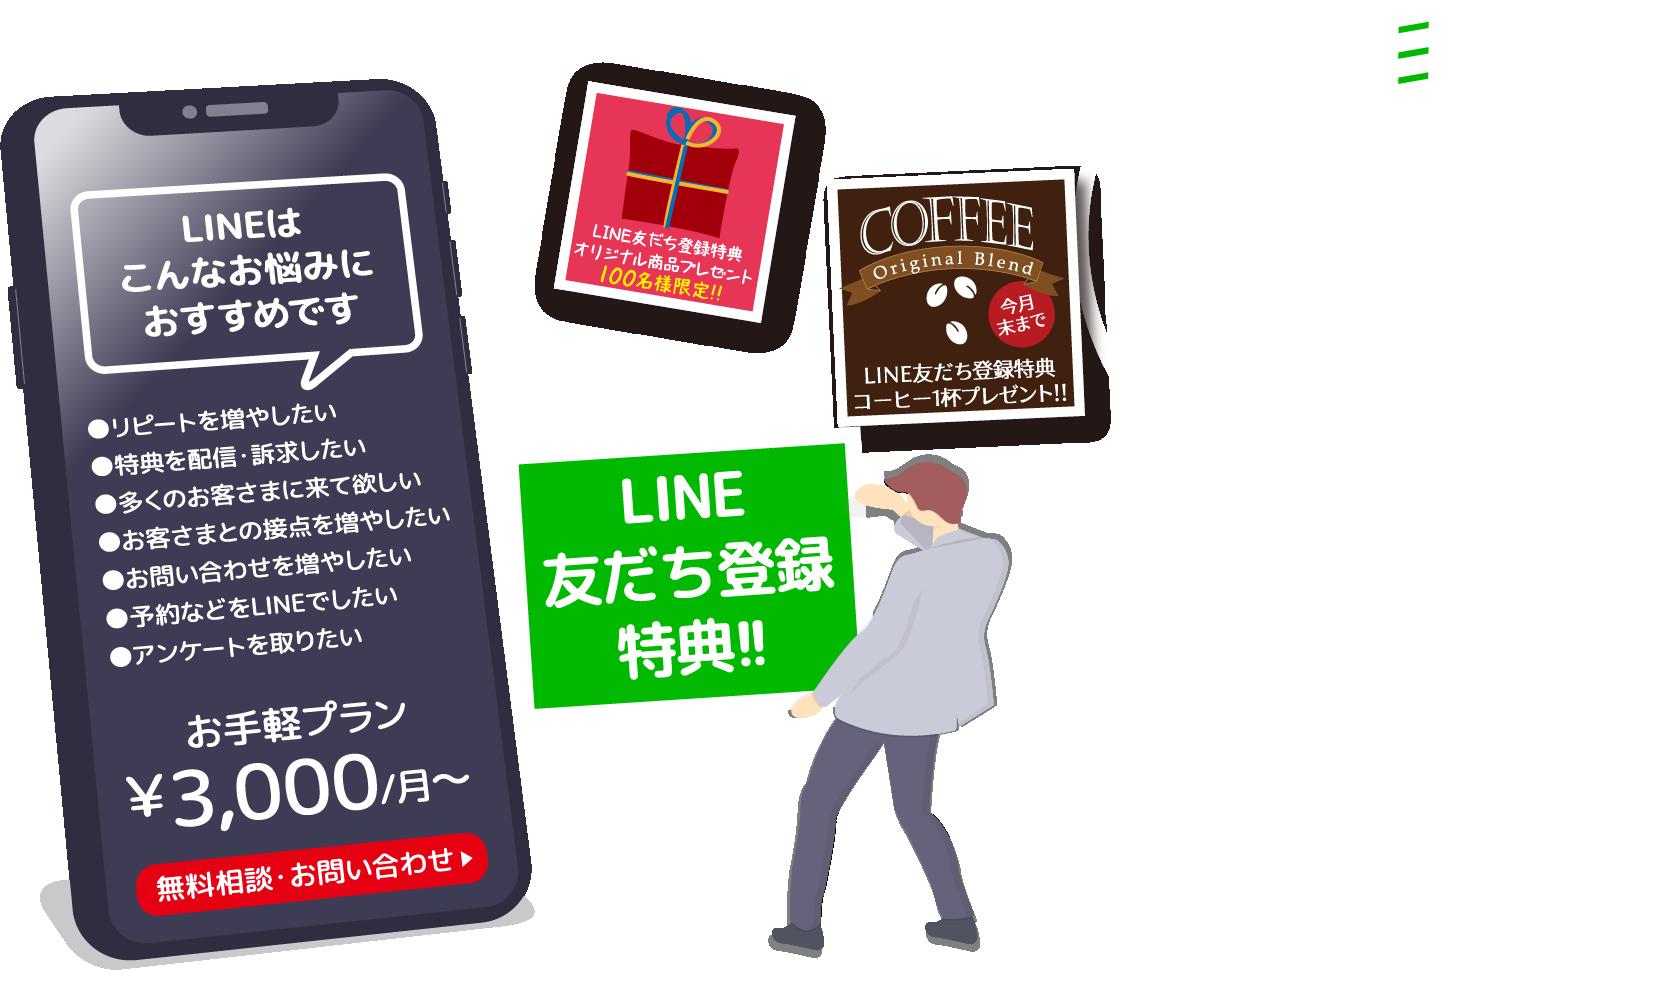 LINE友だち登録特典!!7月31日まで